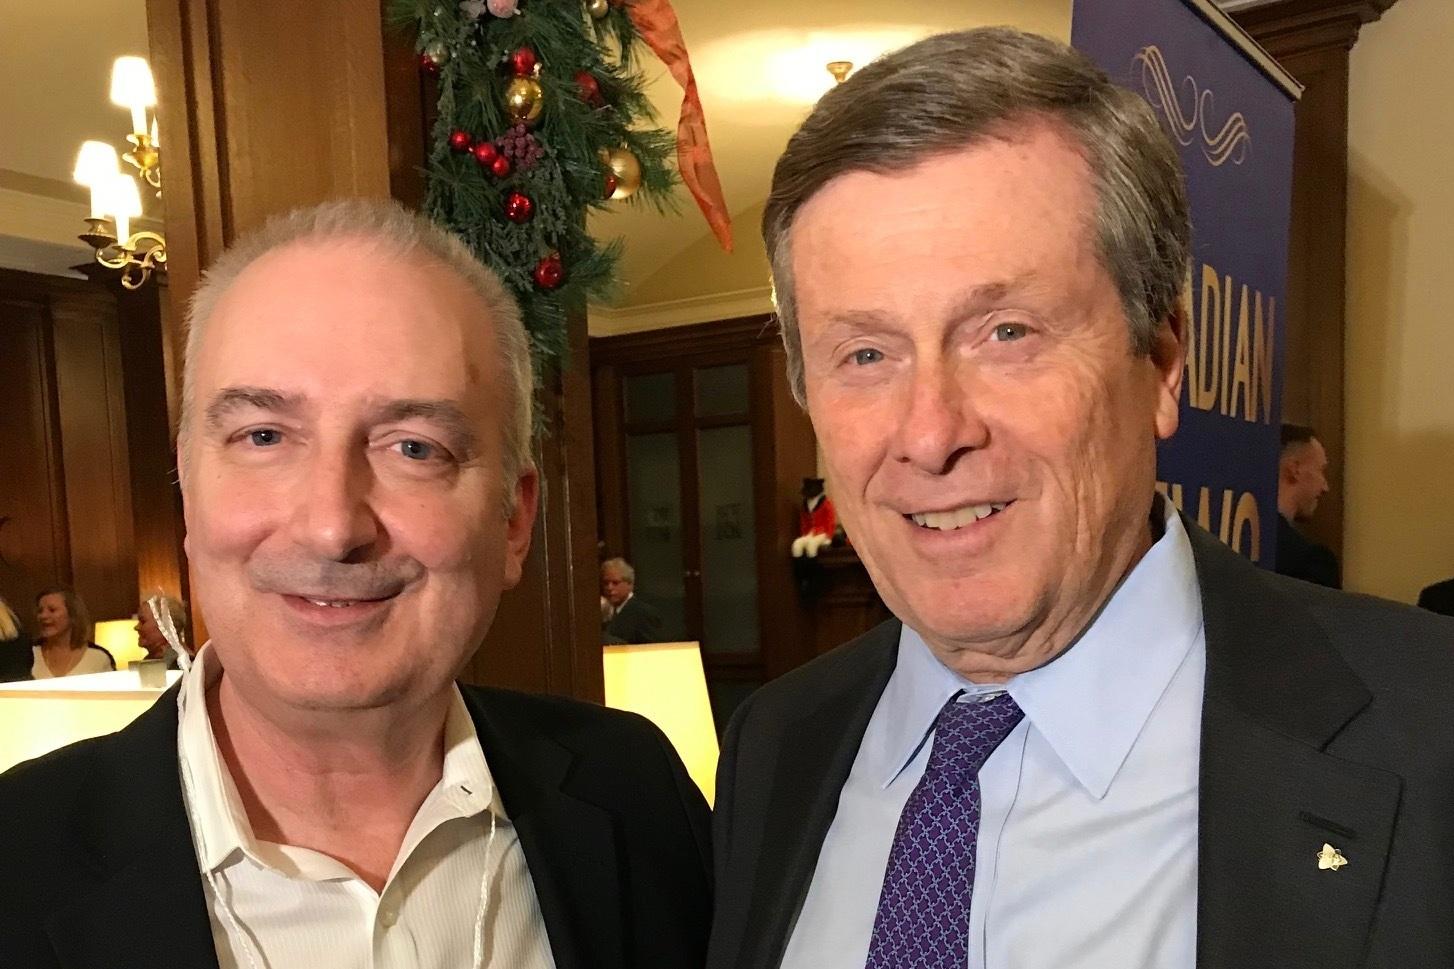 Richard Maxwell with John Tory